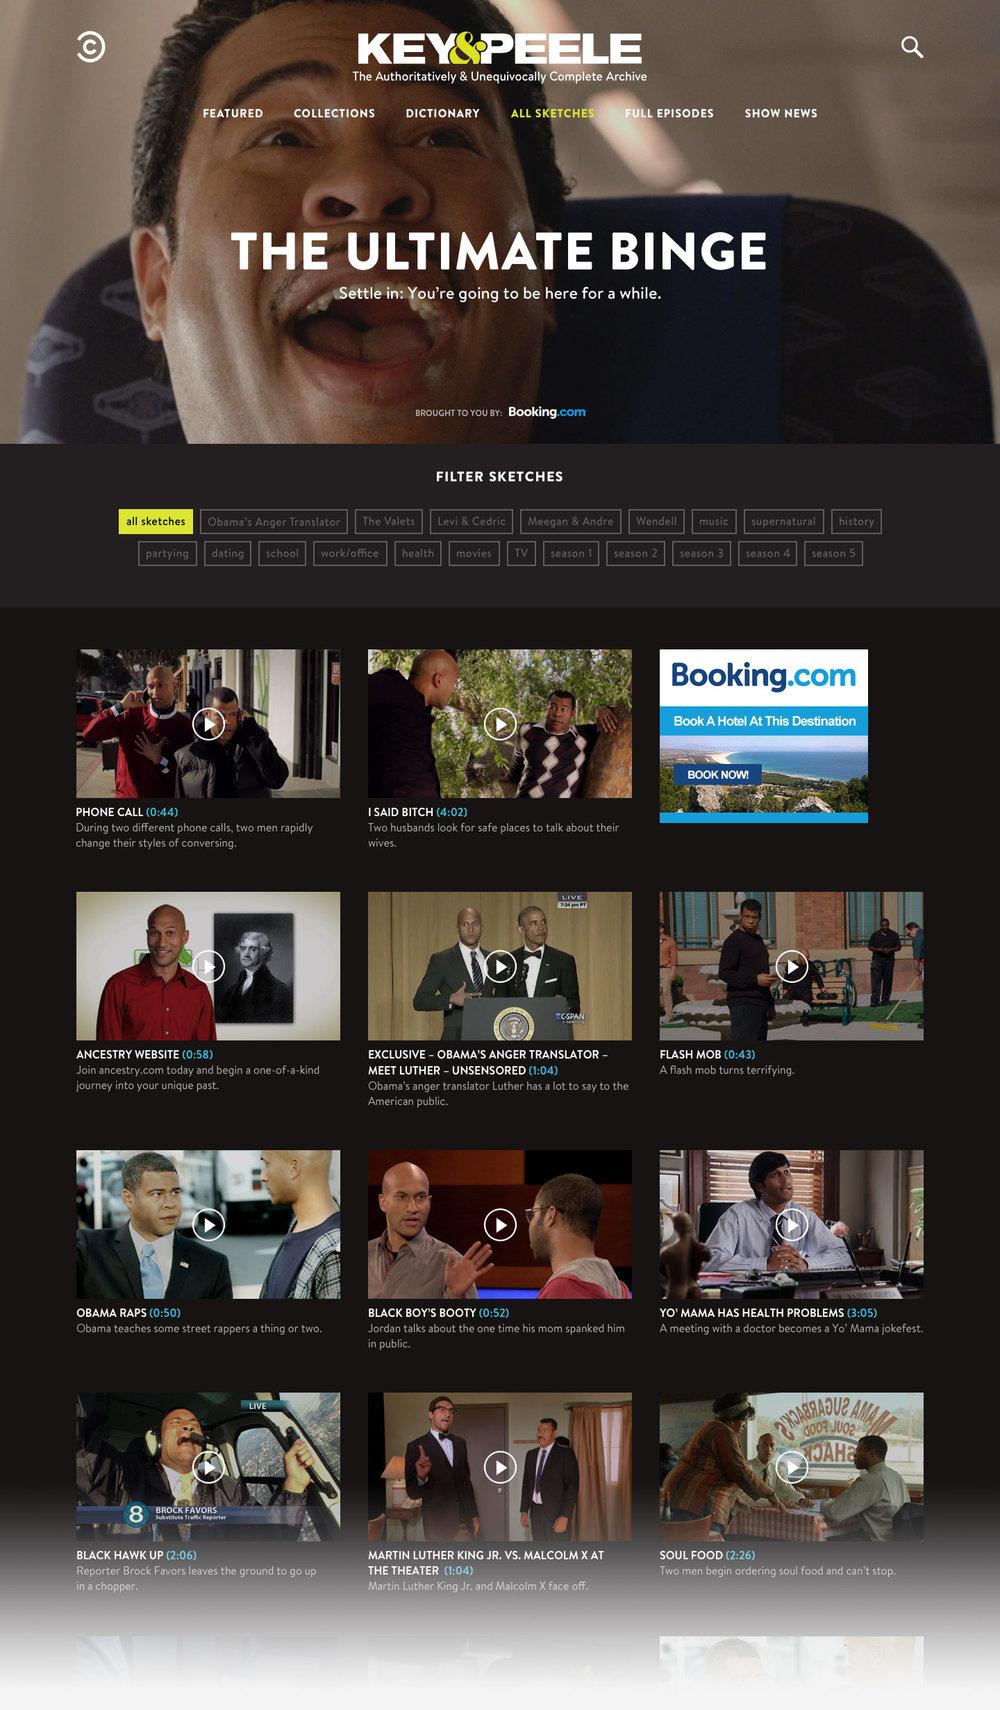 cc_05_all_sketches_hub_desktop.jpg